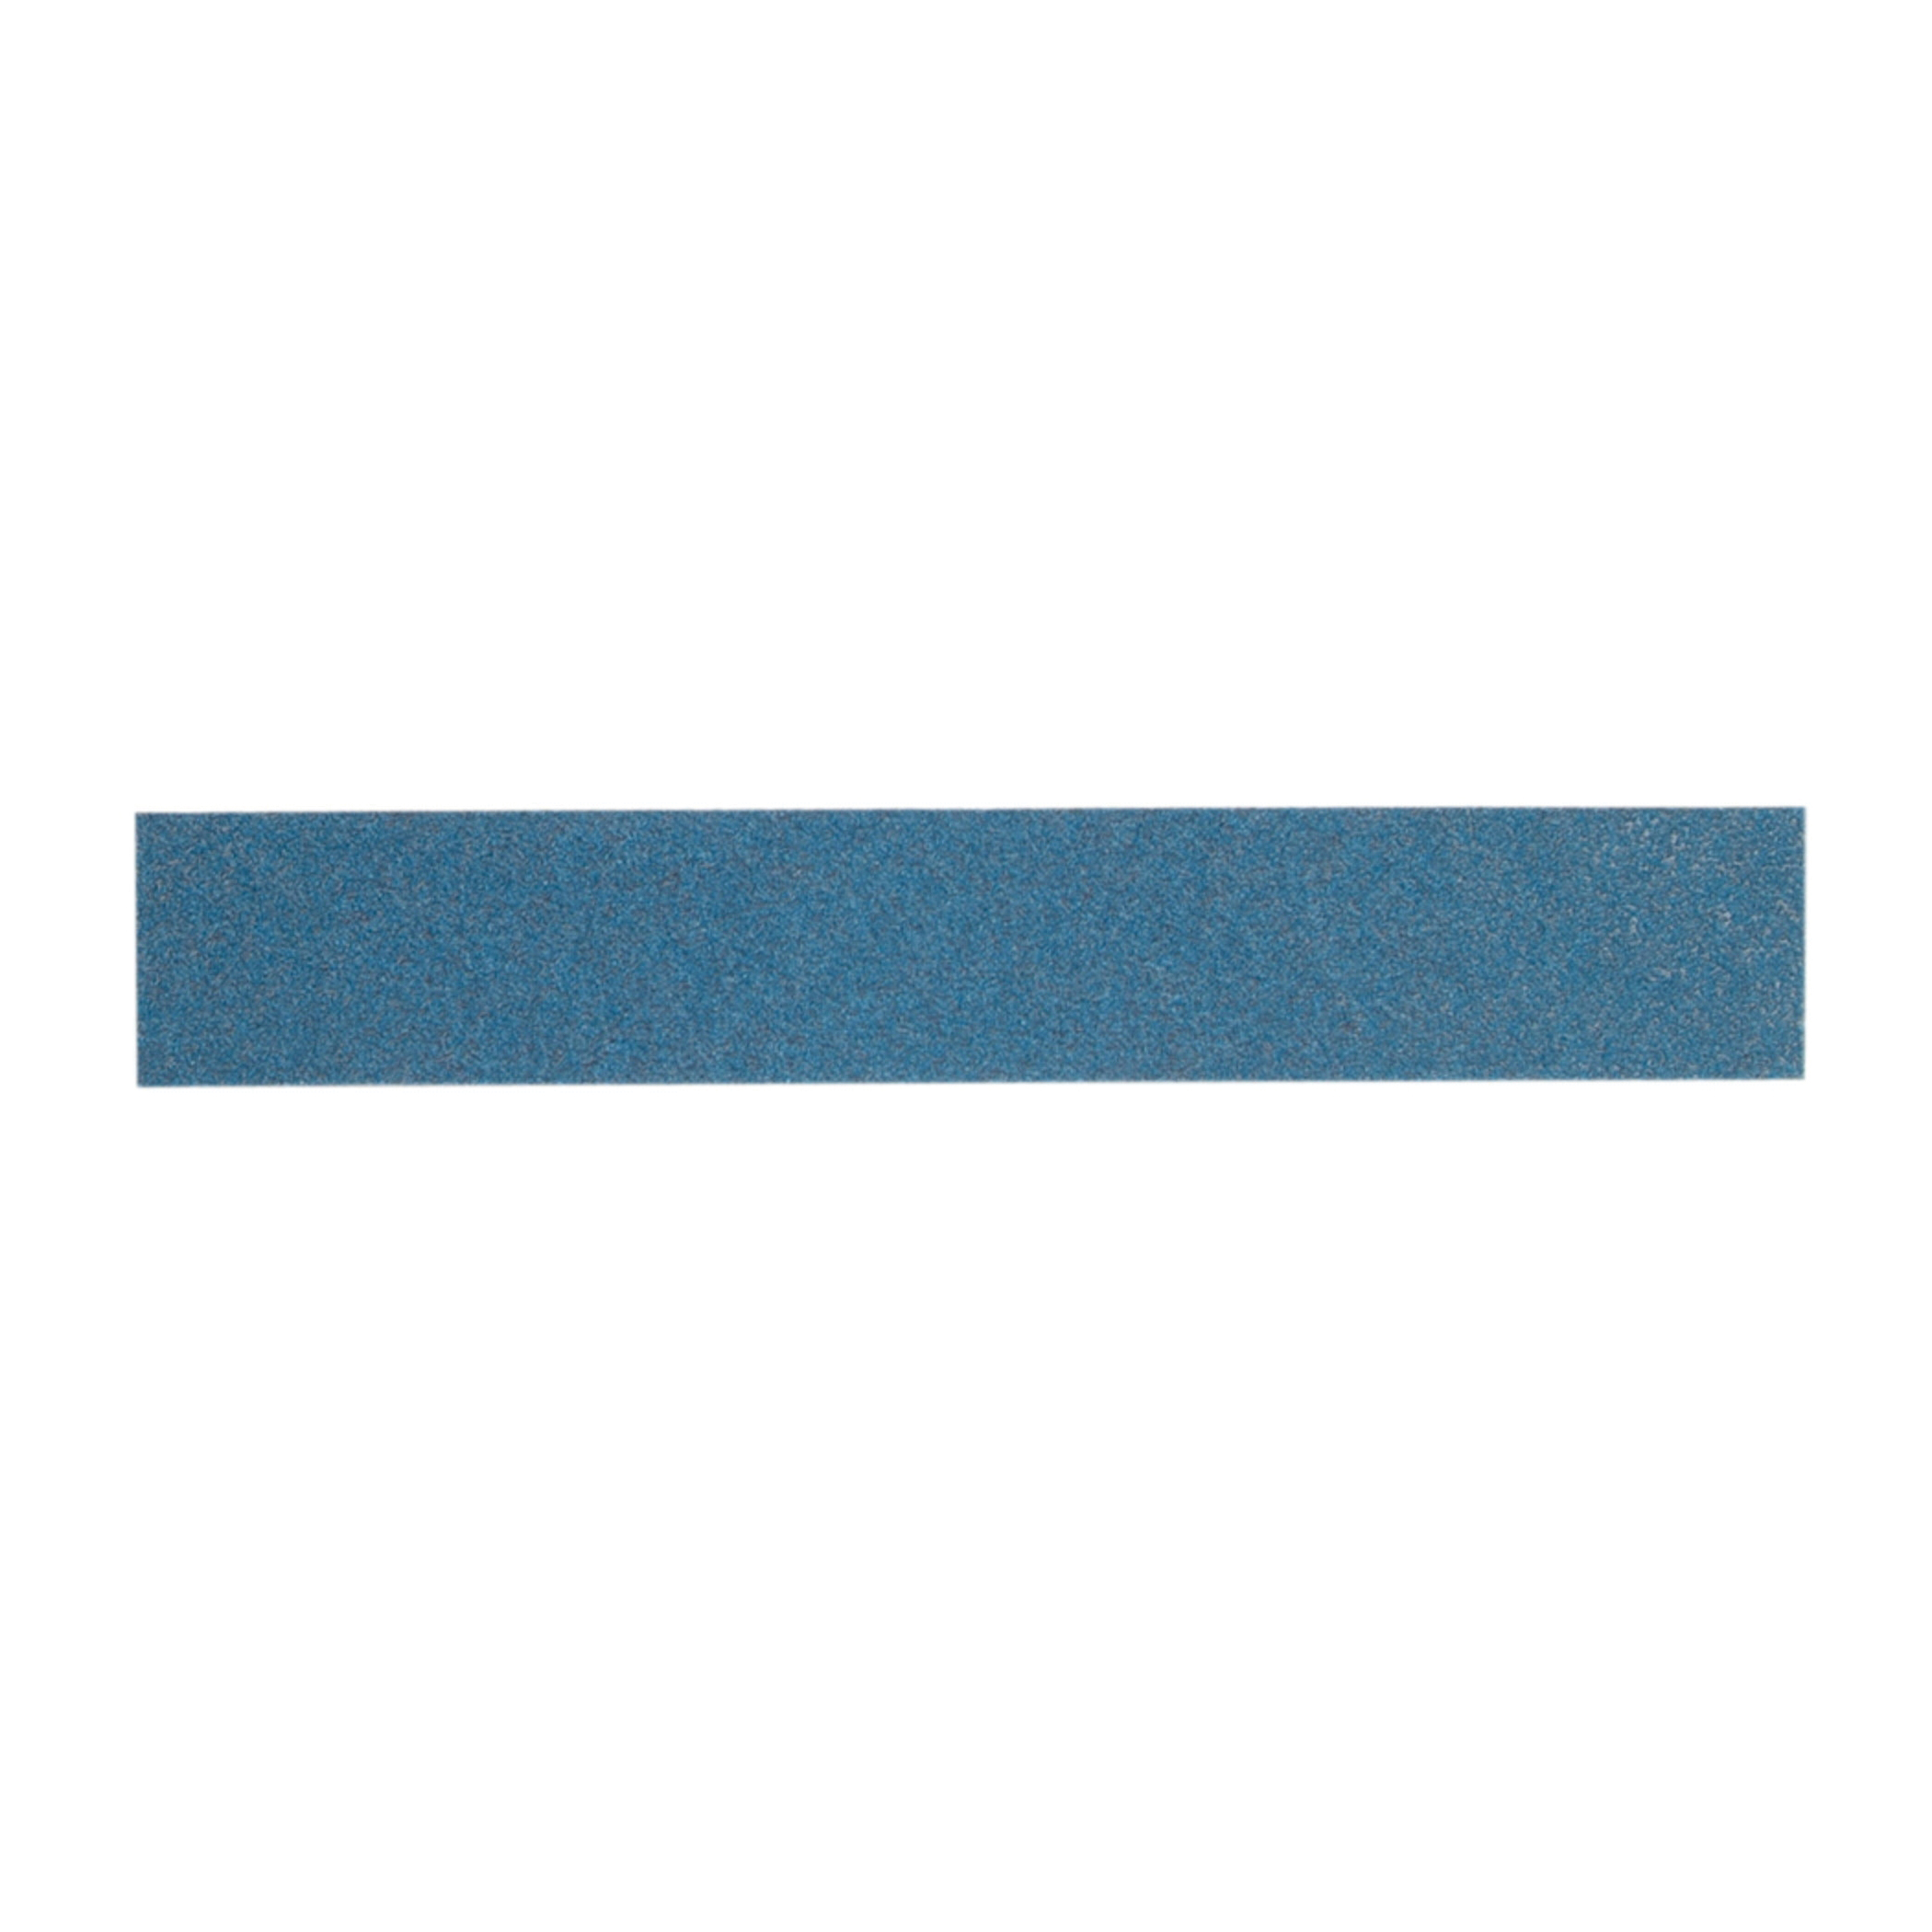 Norton® BlueFire® 66261123610 H875P PSA Coated File Strip, 16-1/2 in L x 2-3/4 in W, 36 Grit, Extra Coarse Grade, Zirconia Alumina Abrasive, Paper Backing